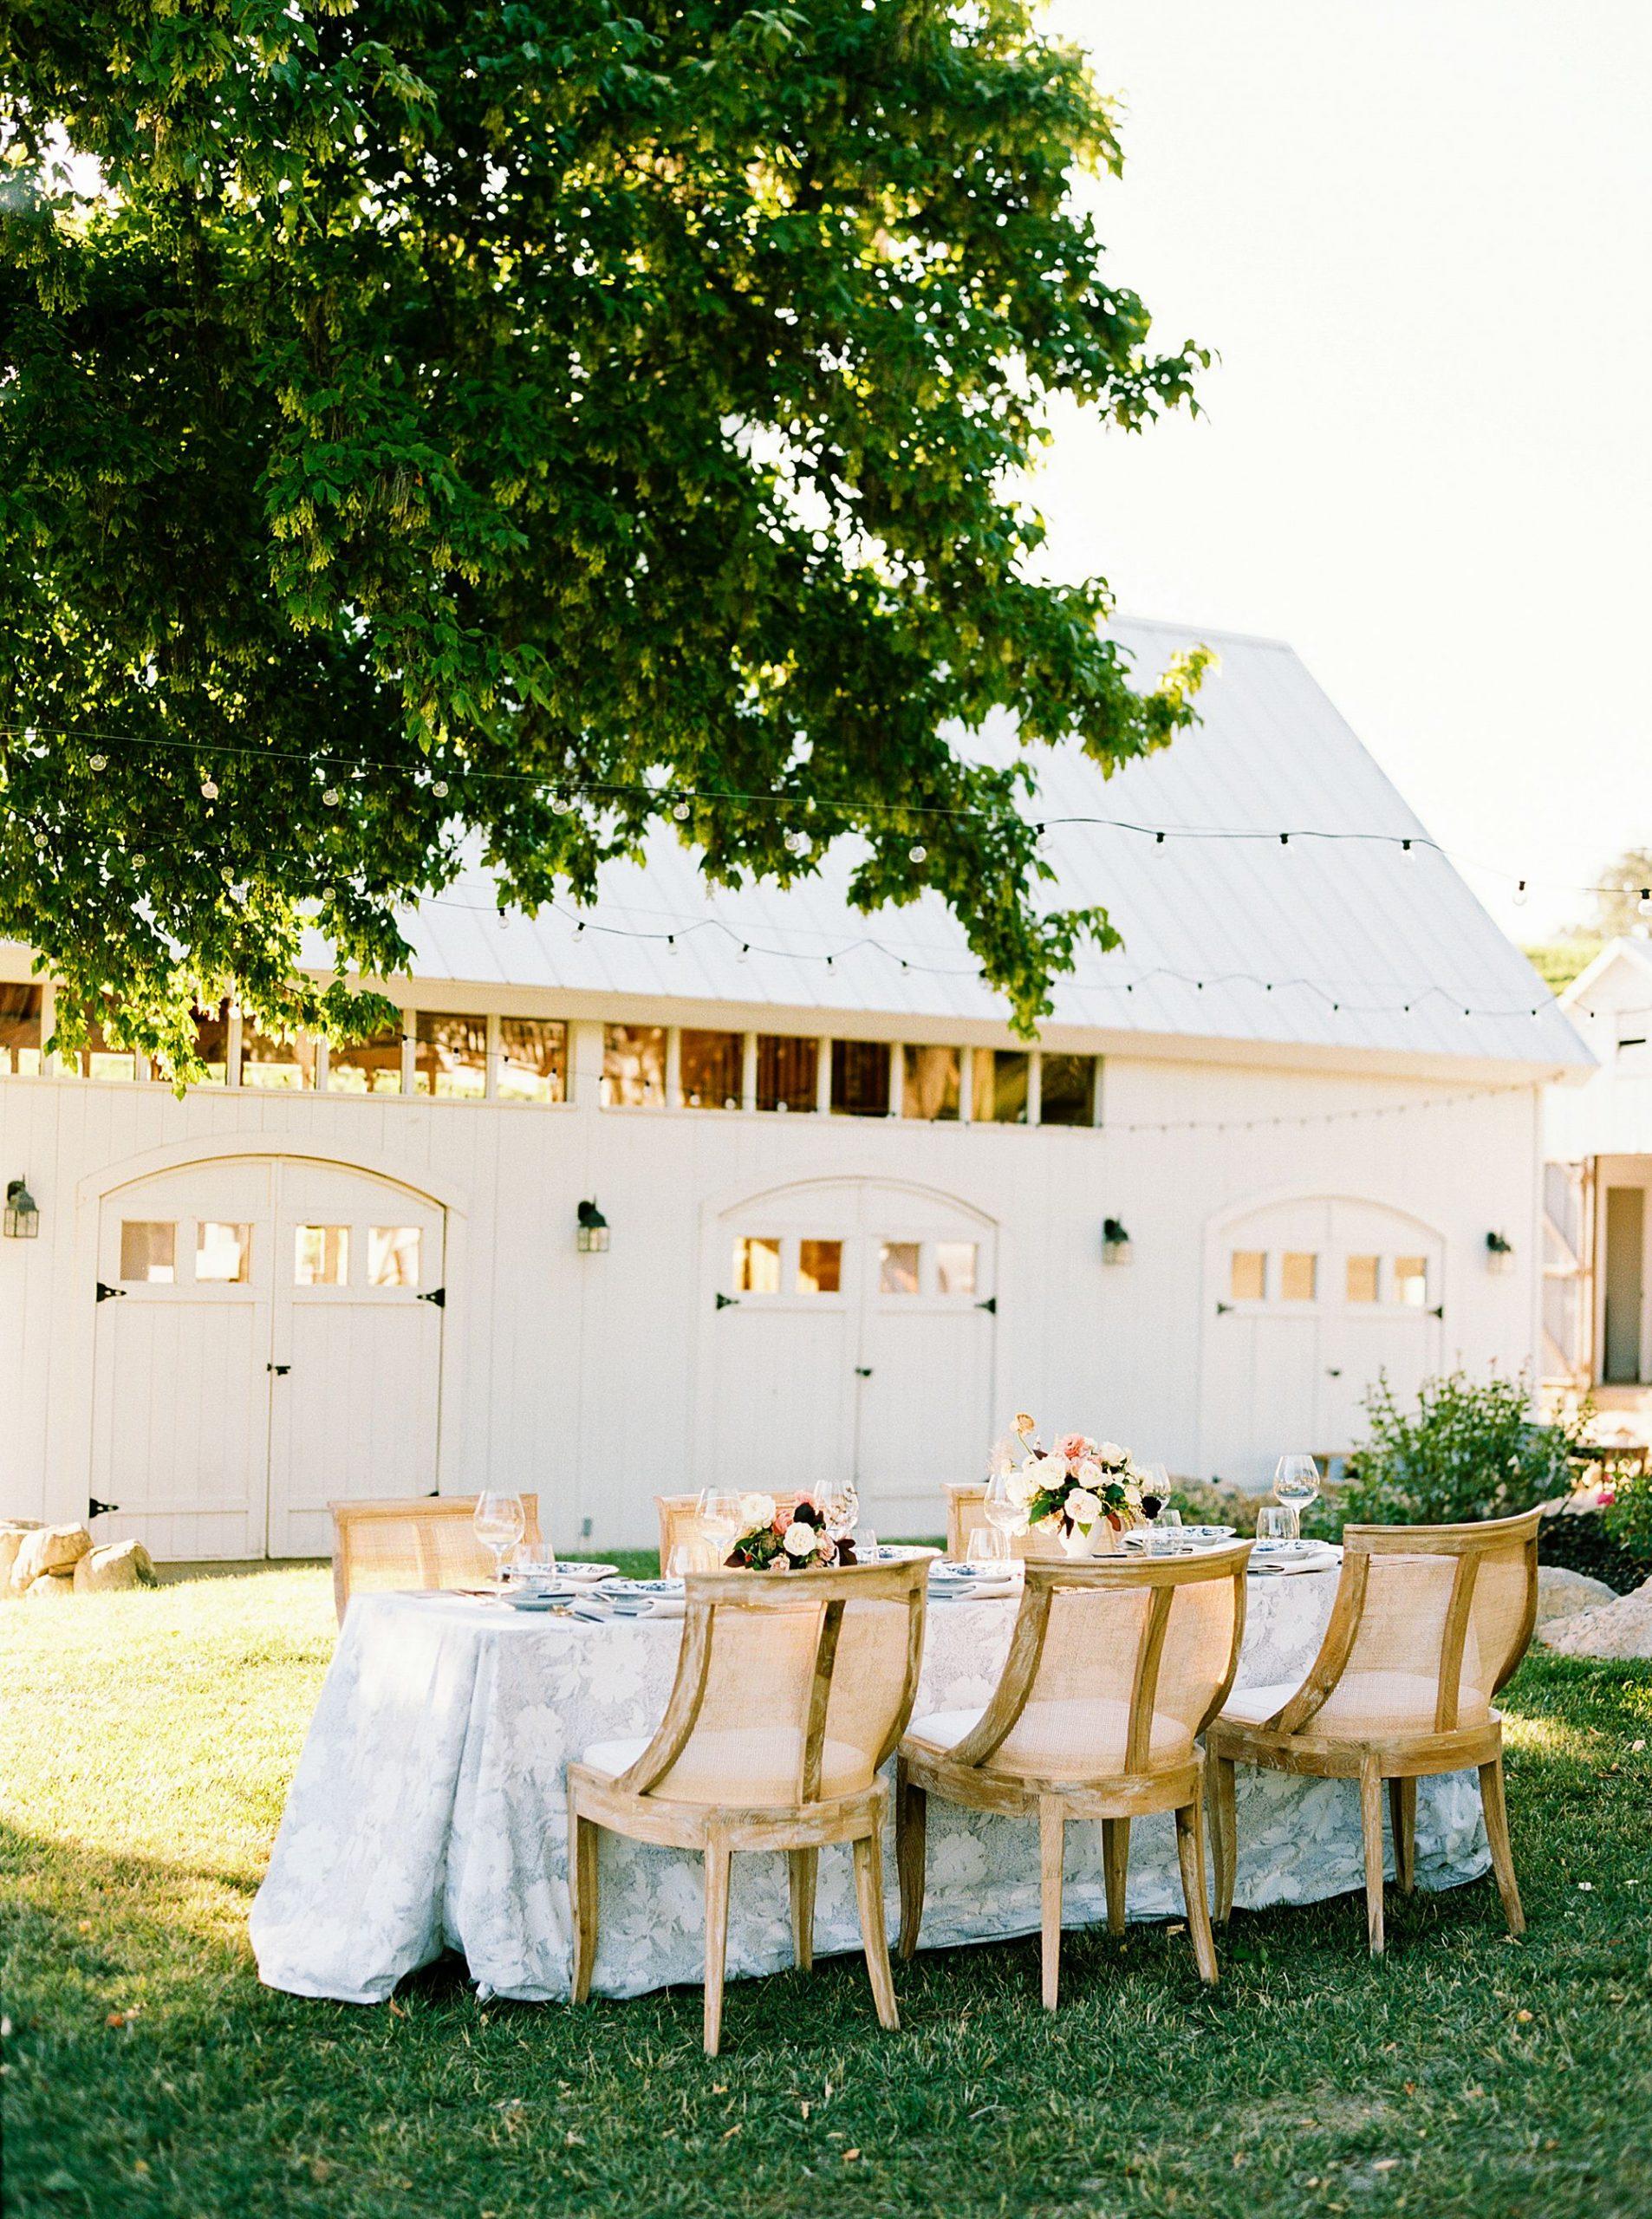 HammerSky Wedding Inspiration Featured on Hey Wedding Lady with Vanessa Noel Events - Ashley Baumgartner - SLO Wedding Photographer_0034.jpg